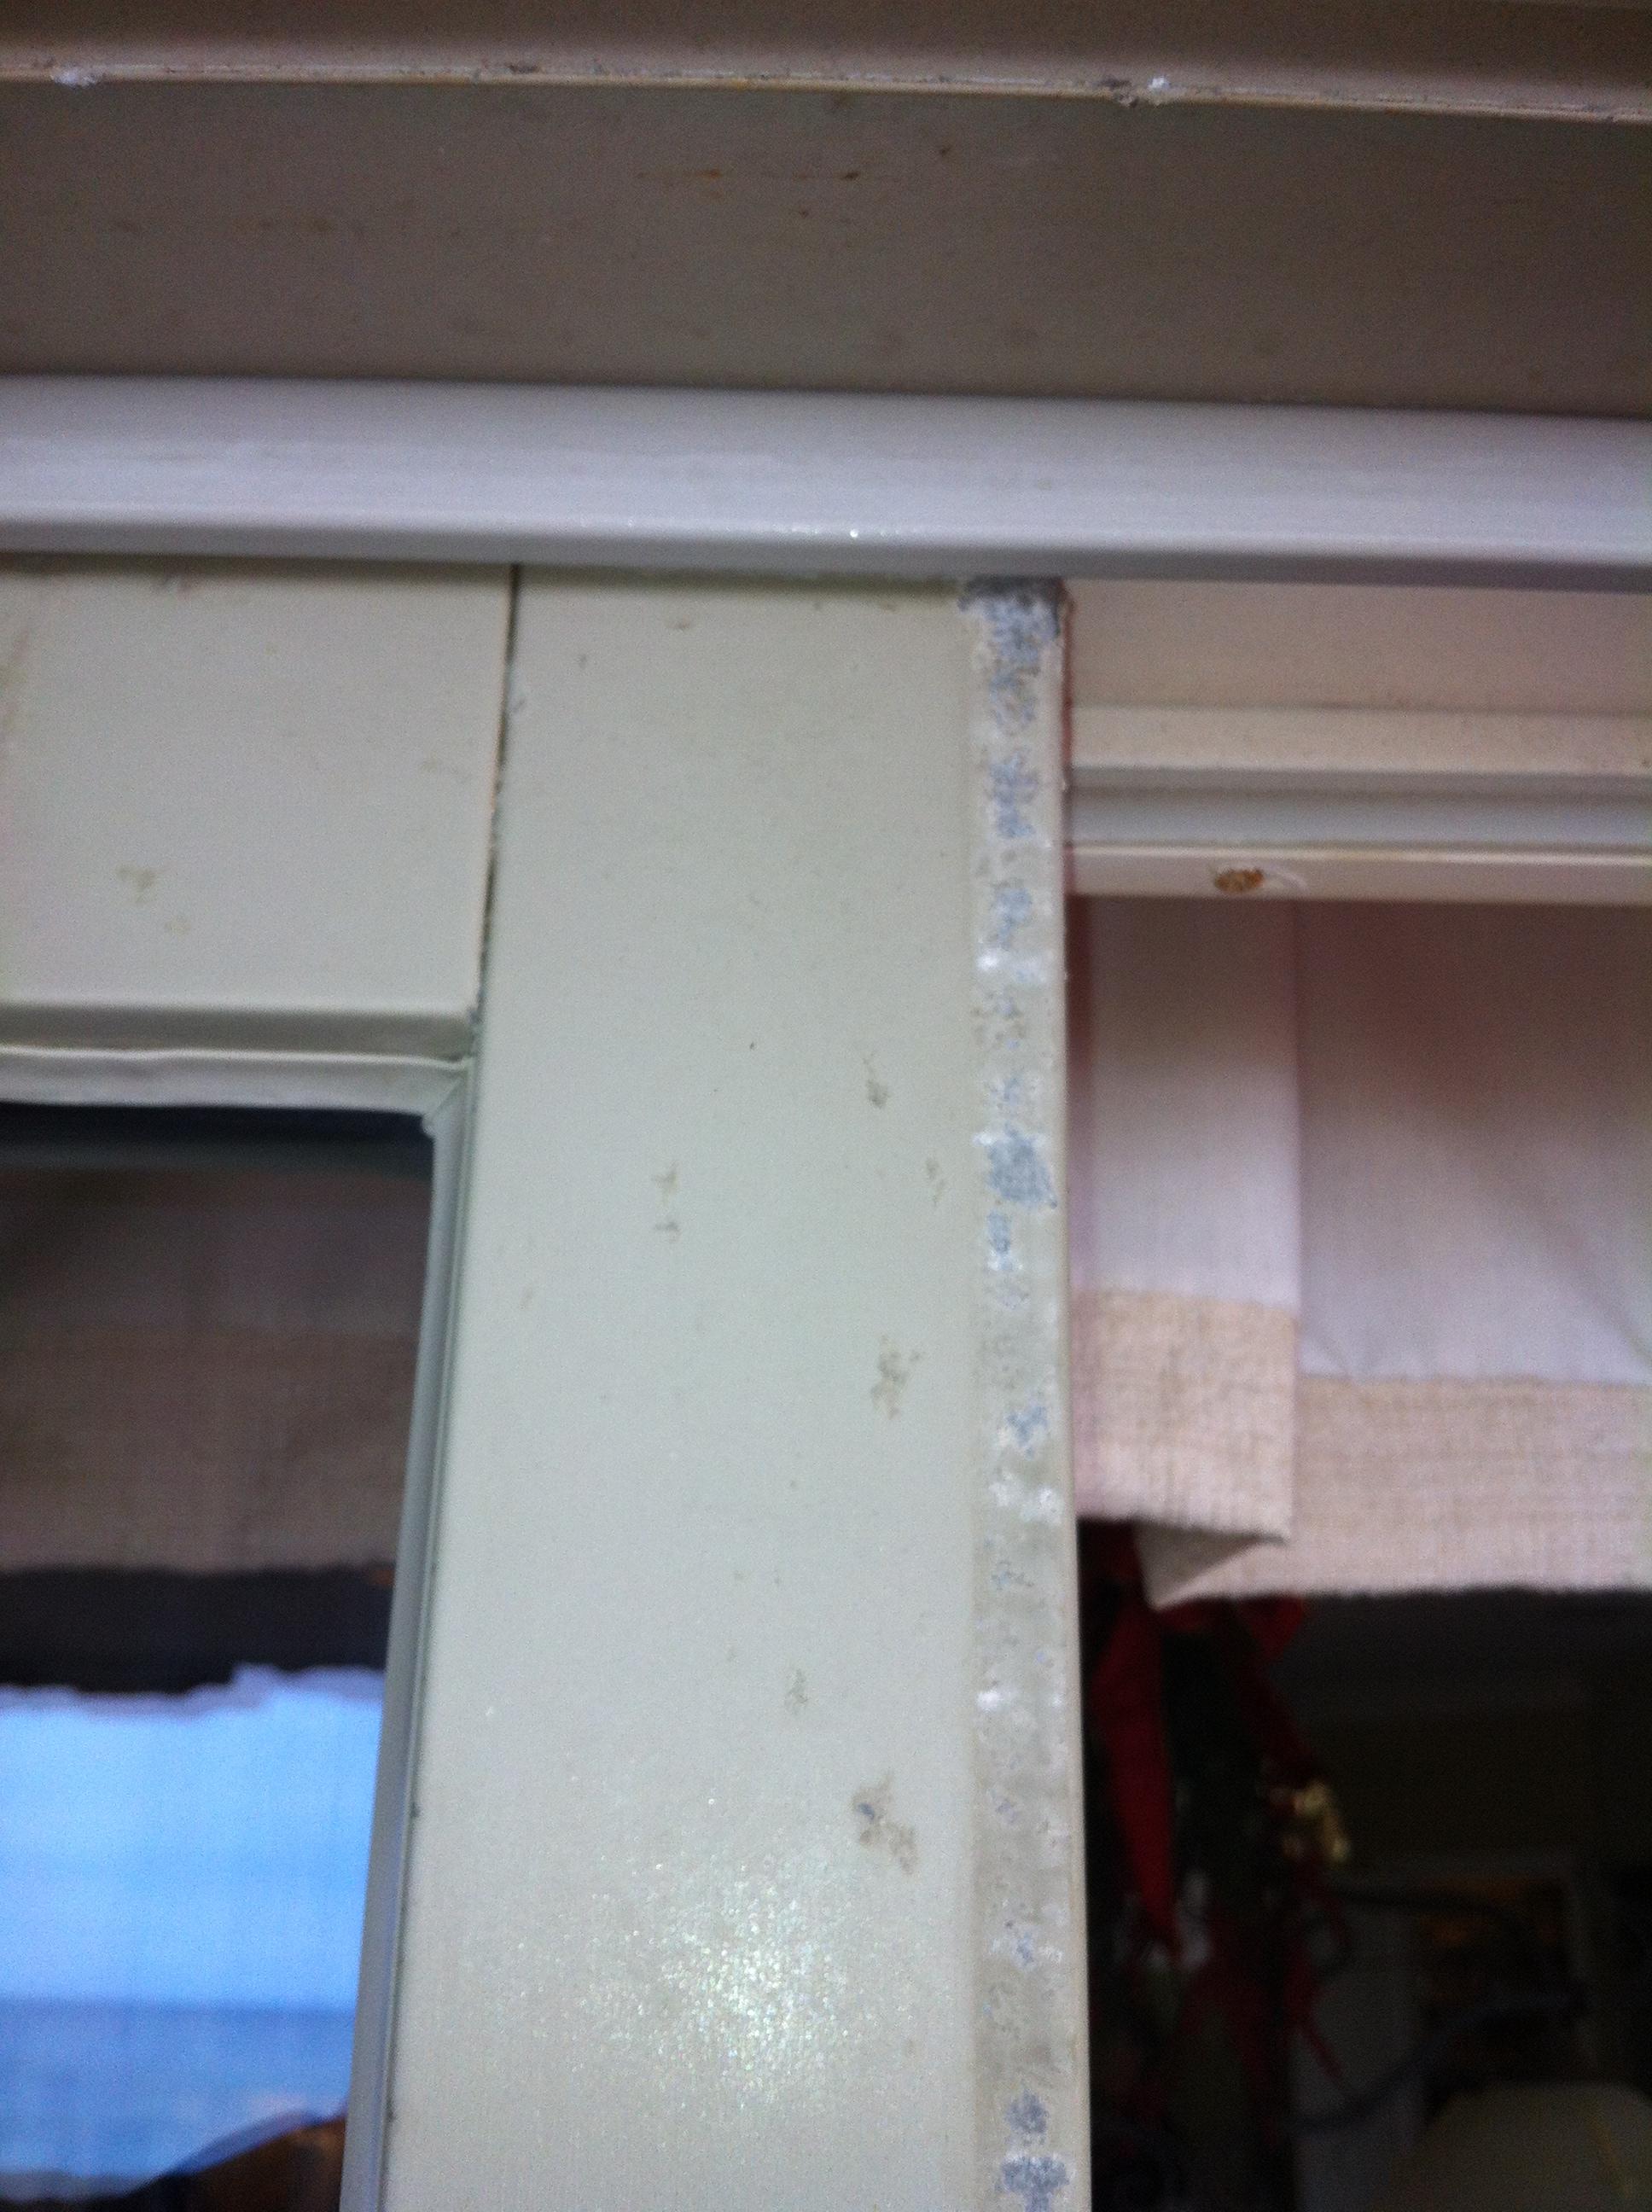 2592 #2F669C RollFormAluminumCladDoorPanel Marin Glass And Windows Blog pic Aluminum Clad Doors 48011936